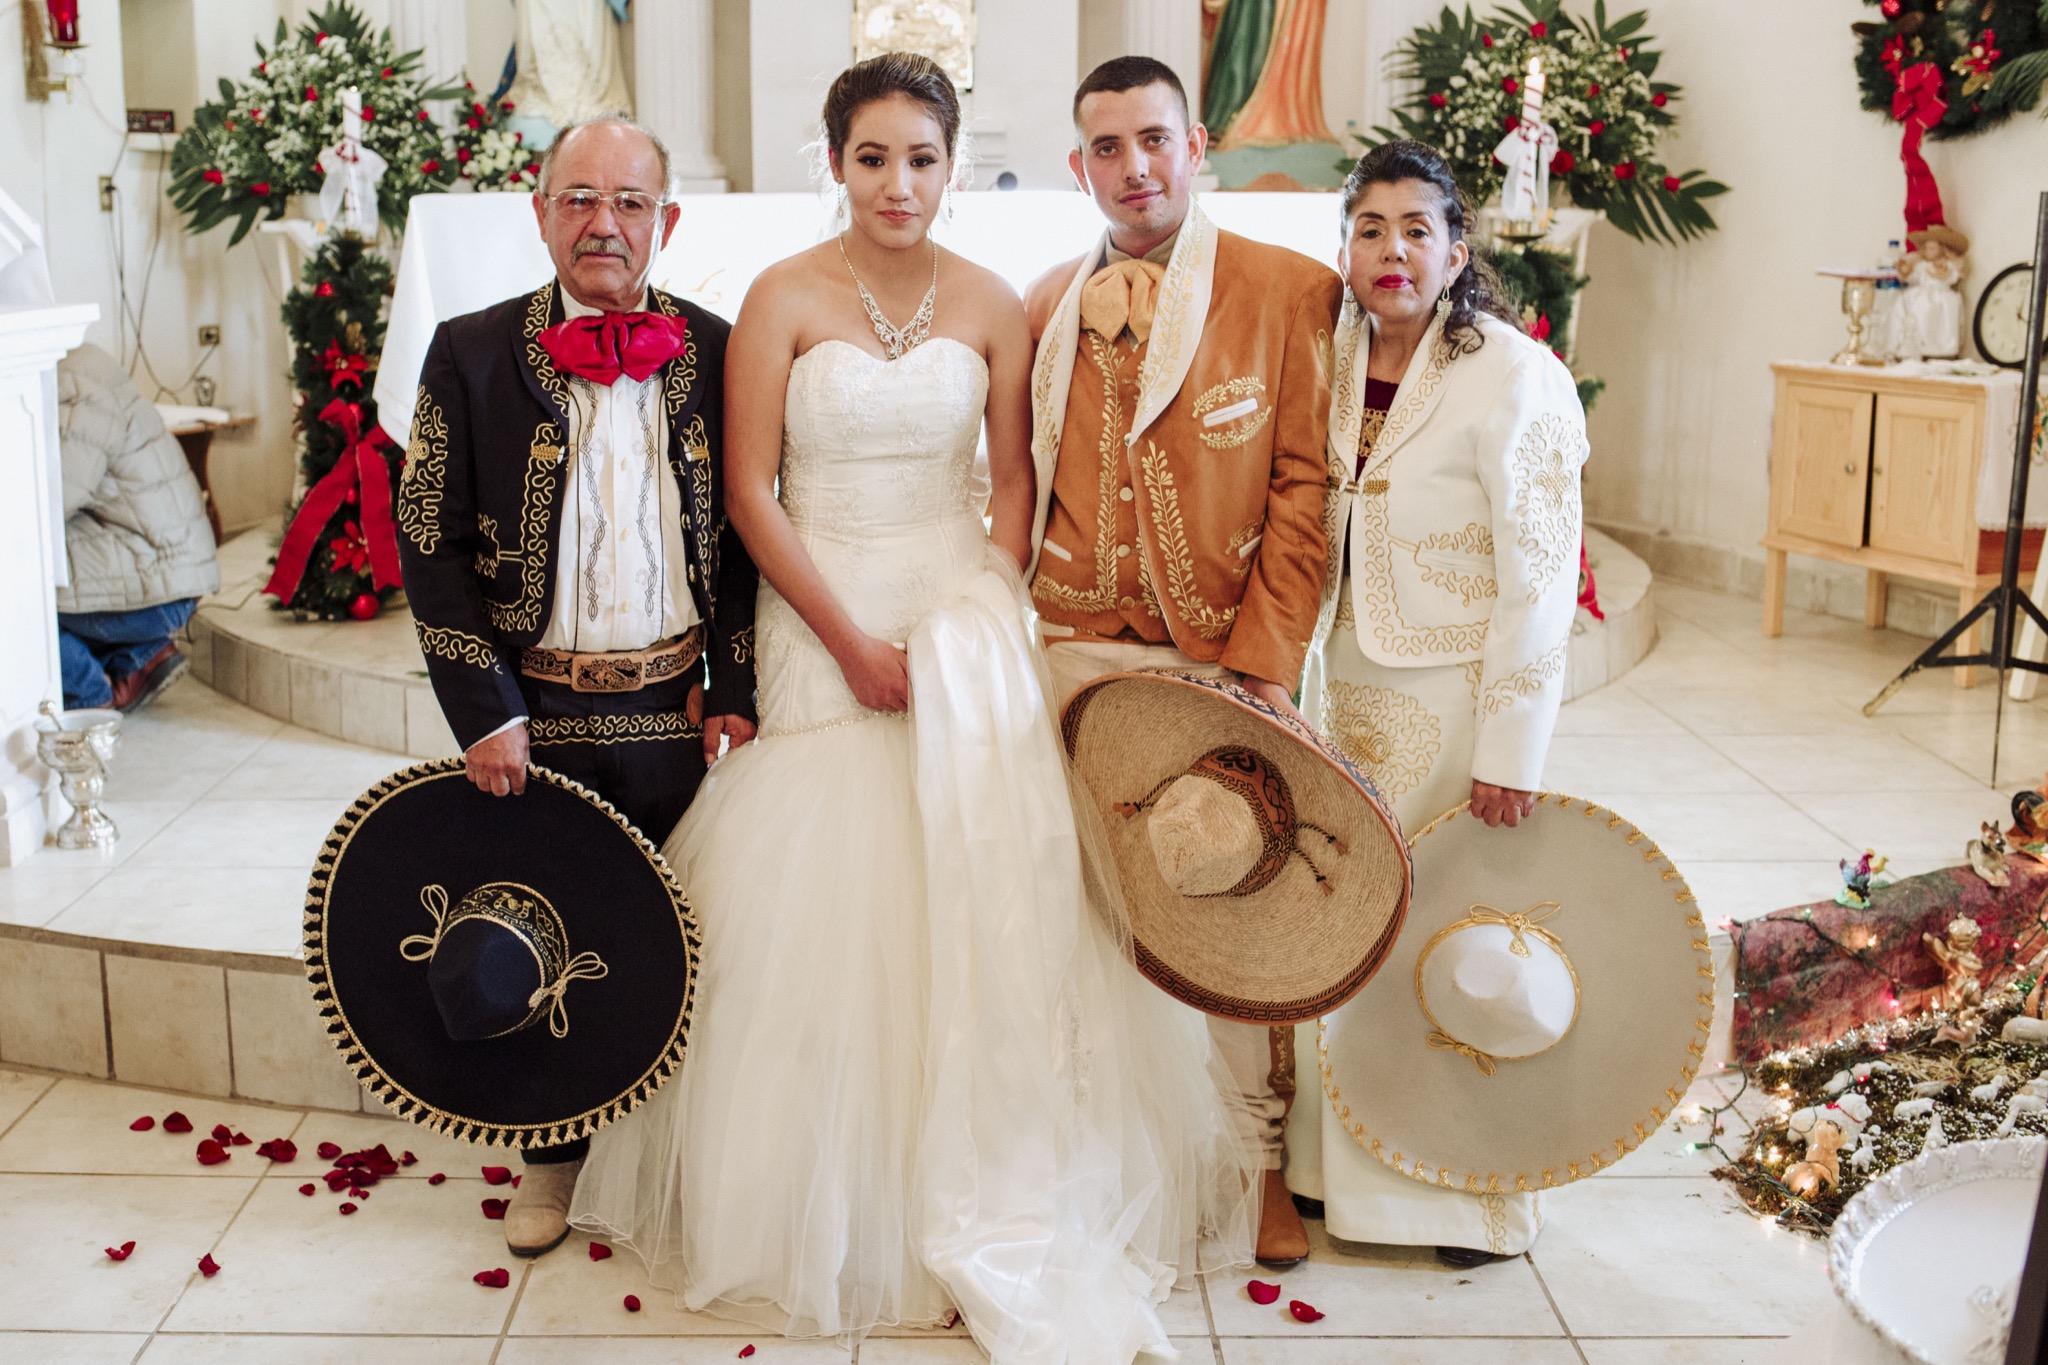 javier_noriega_fotografo_profesional_bodas_zacatecas_mexico_chihuahua_photographer_15